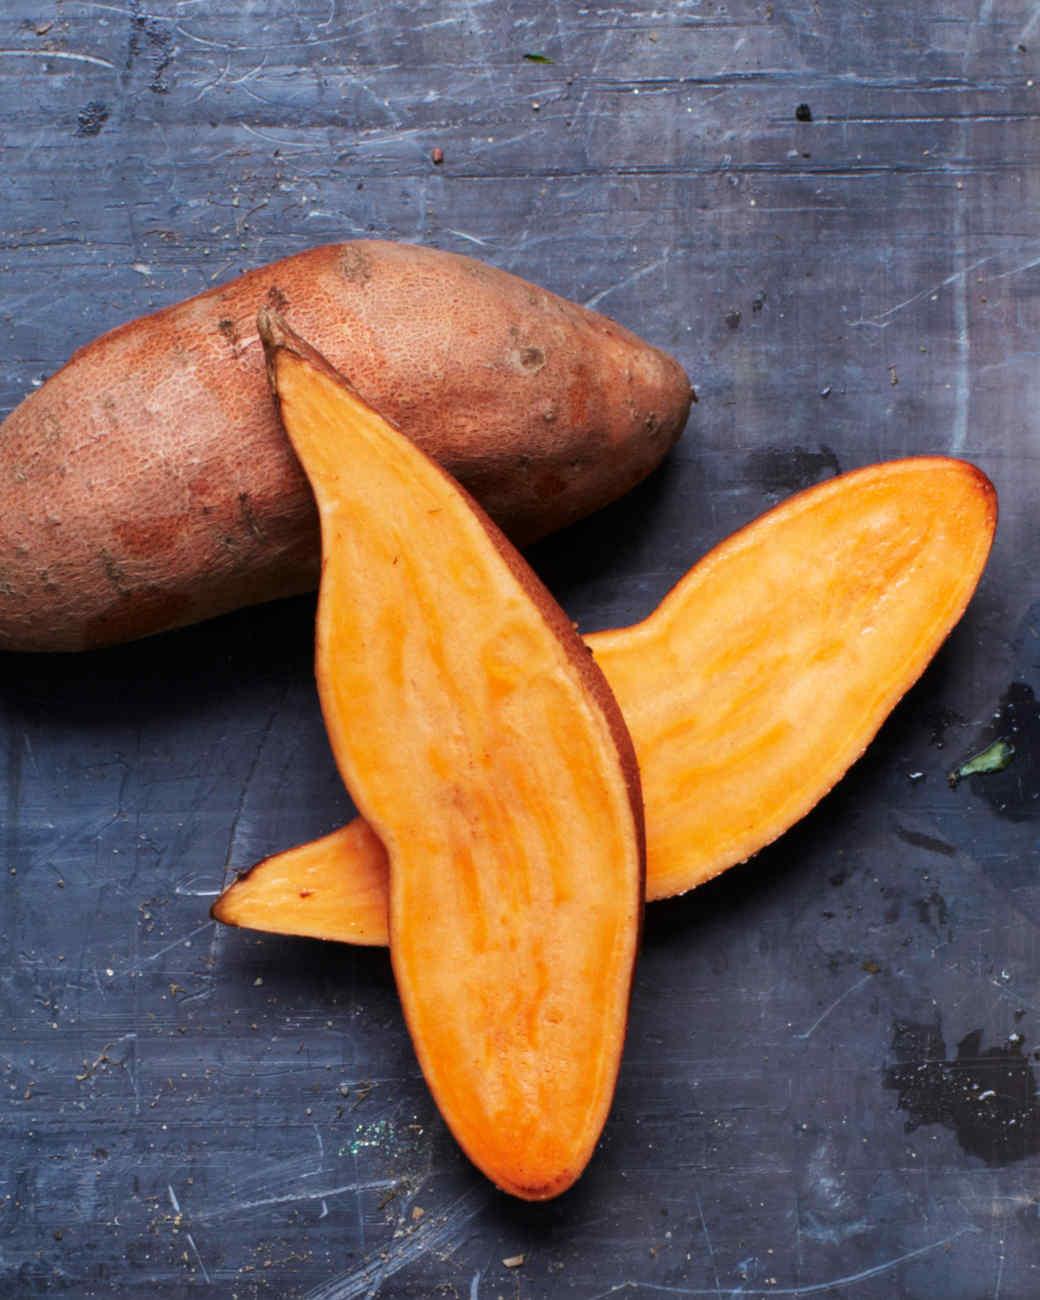 sweet-potato-roots-tubers-202-d110486.jpg